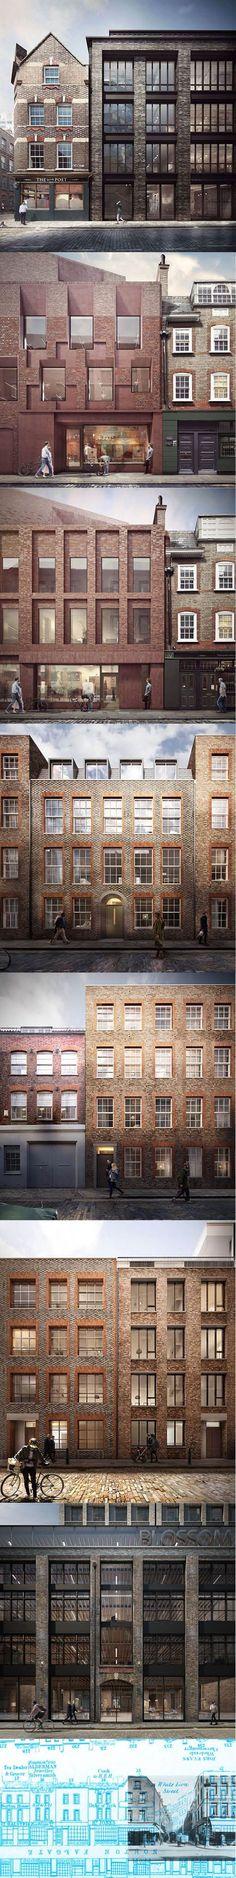 2015 Duggan Morris - Blossom Street / concept / London UK / brick / AHMM / Forbes Massie / concept